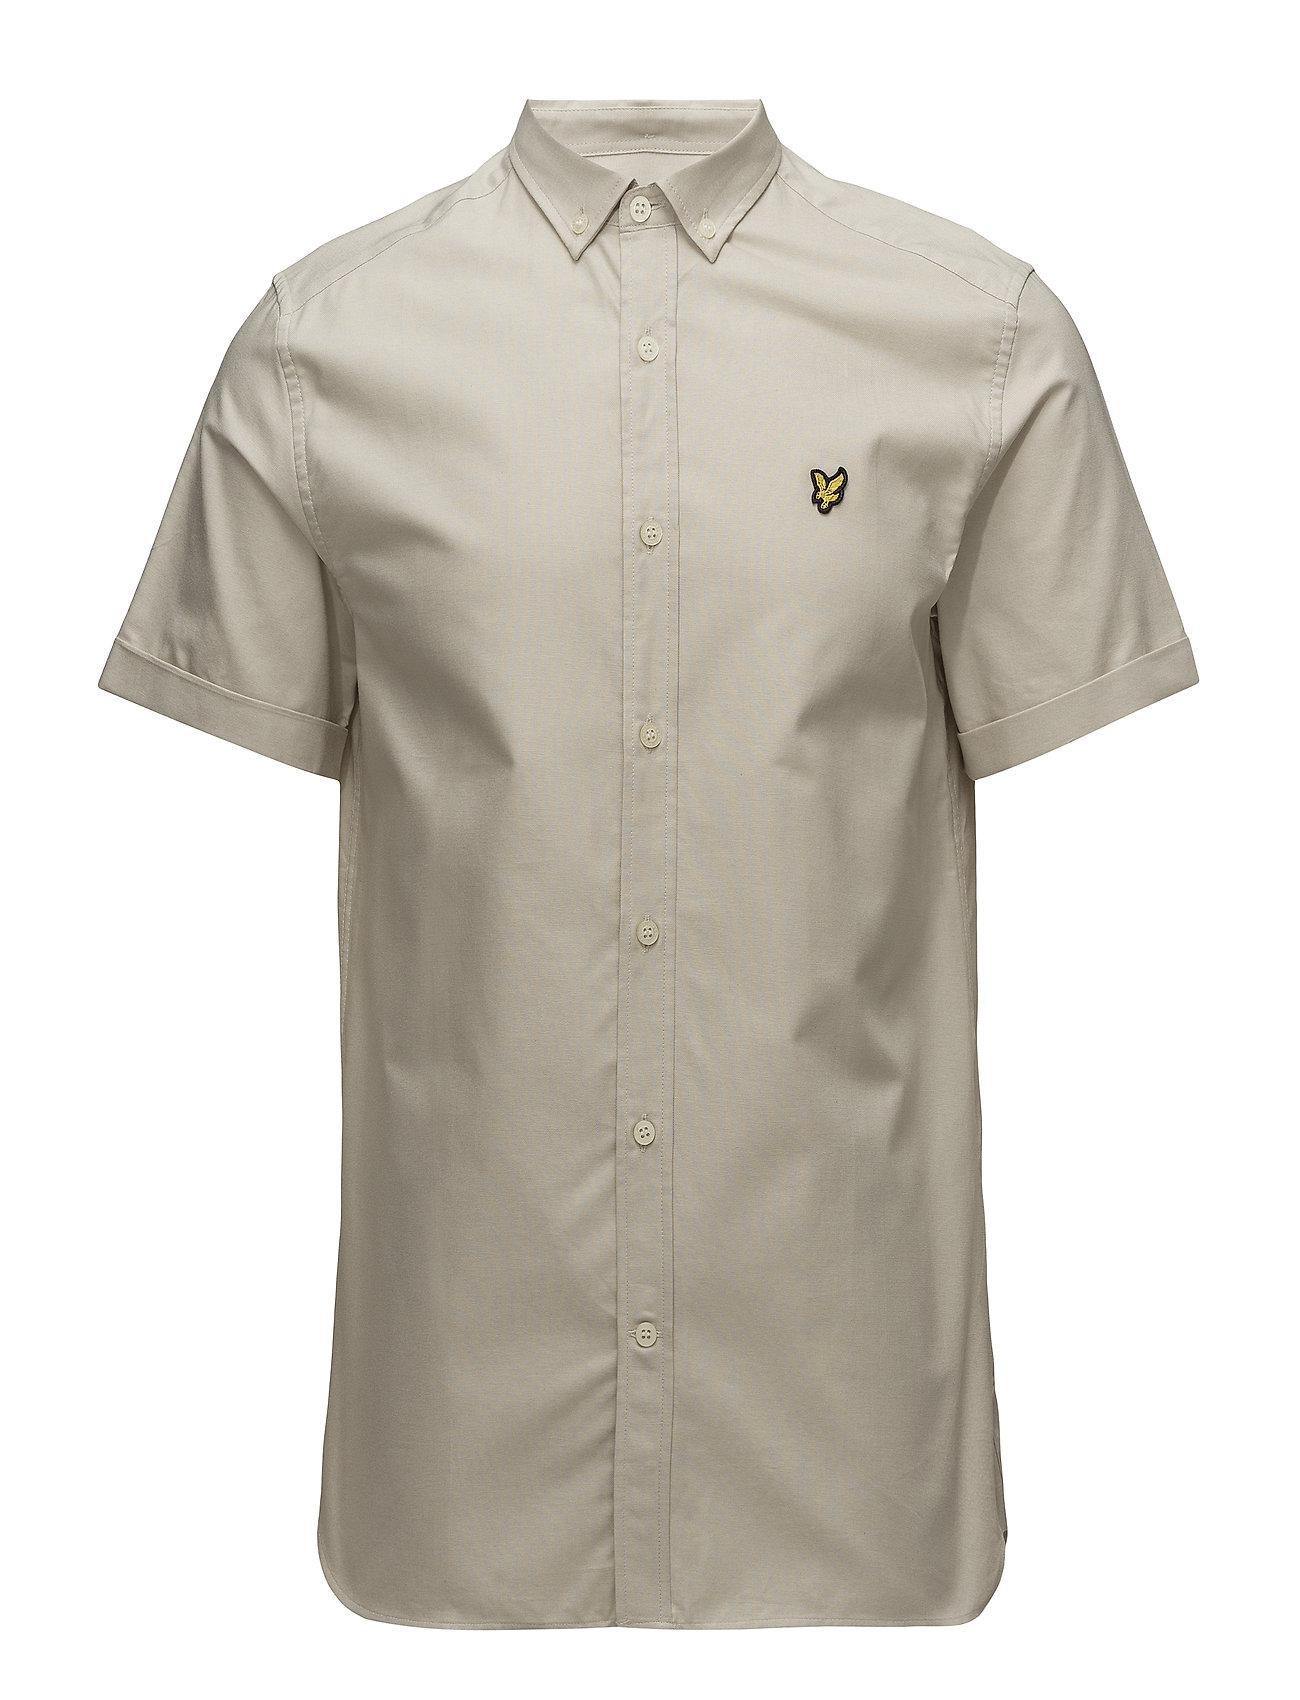 Lyle & Scott SS Oxford Shirt